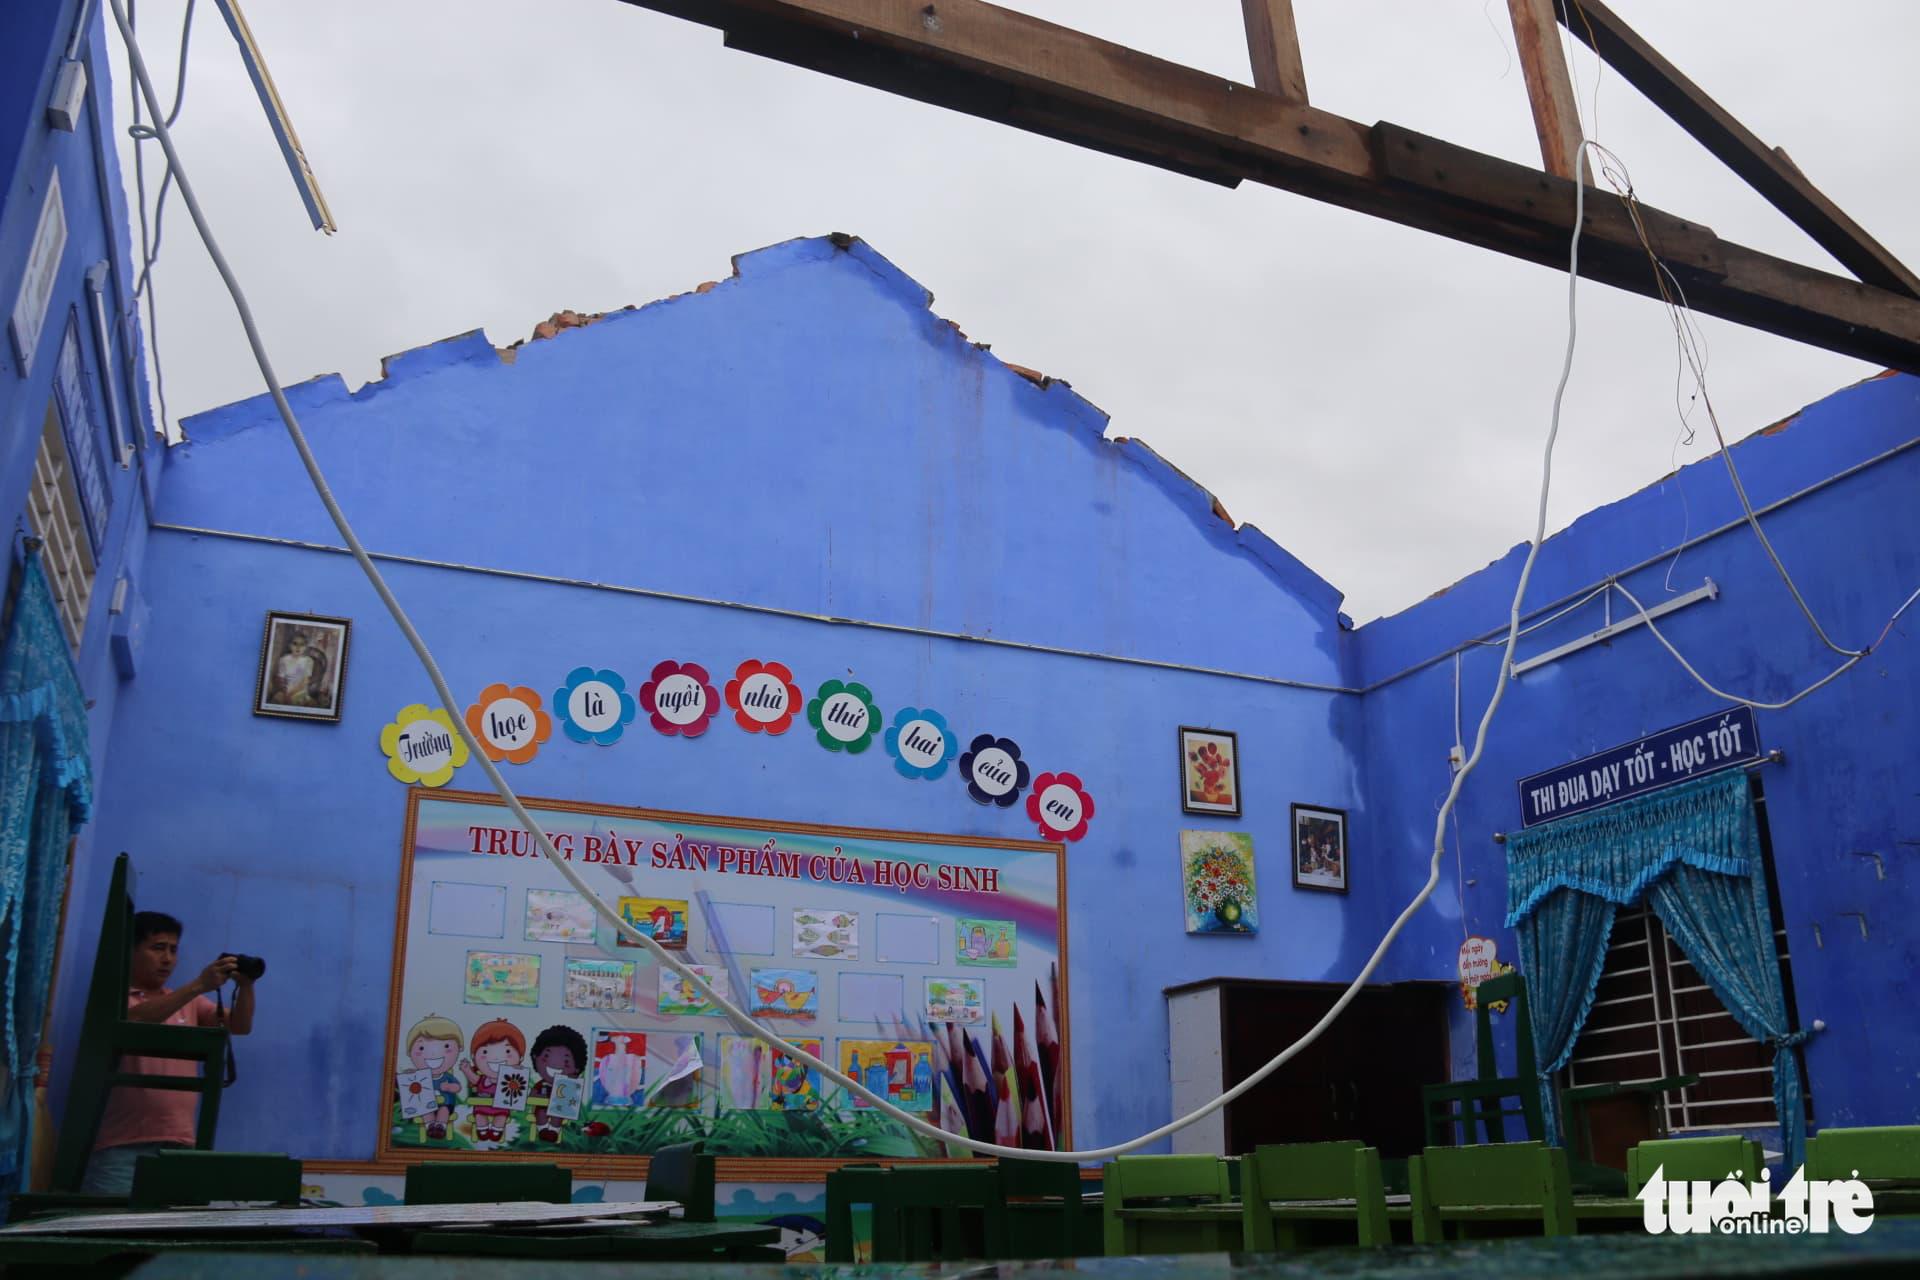 19 injured after Storm Vamco makes landfall in central Vietnam